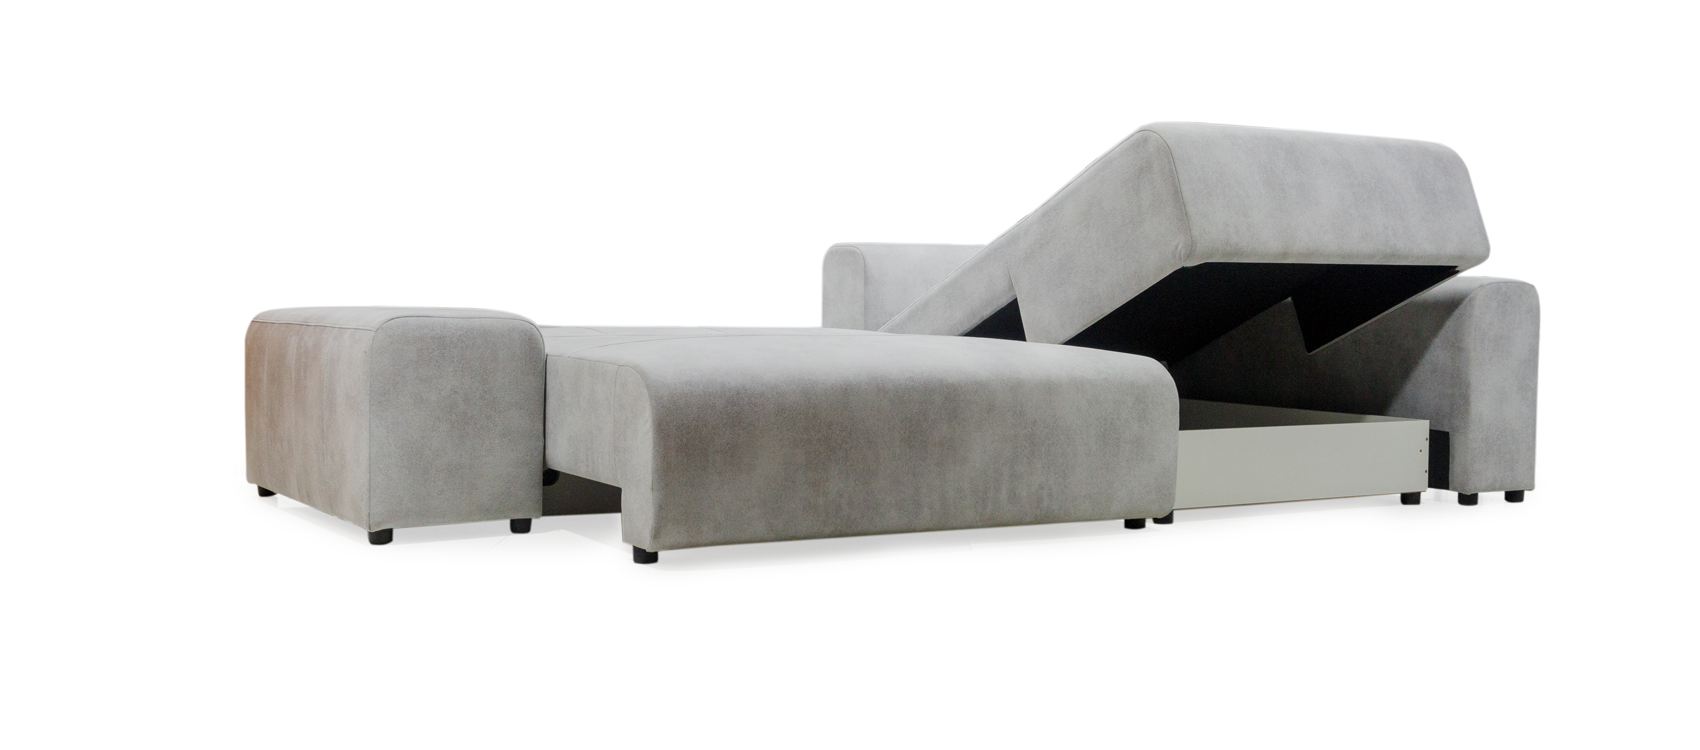 Sofa RAFT фото 8